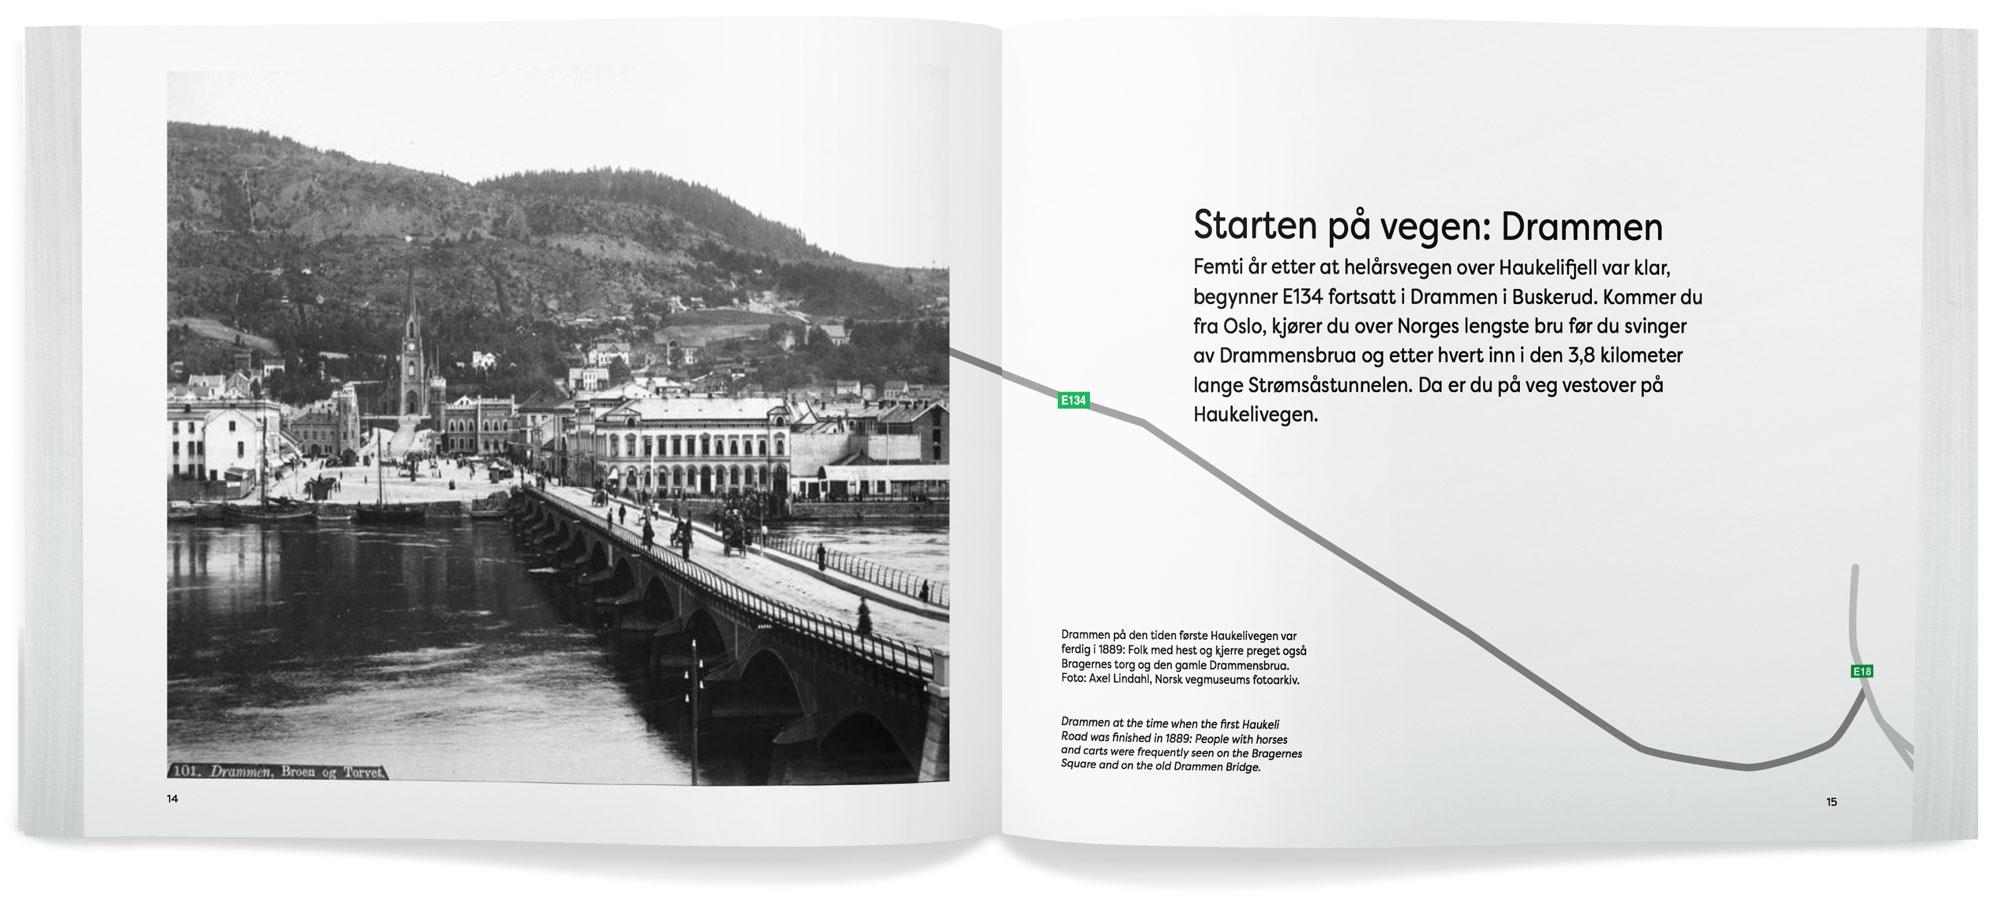 Plus-Book-8001-2017-10-15_1_2.jpg